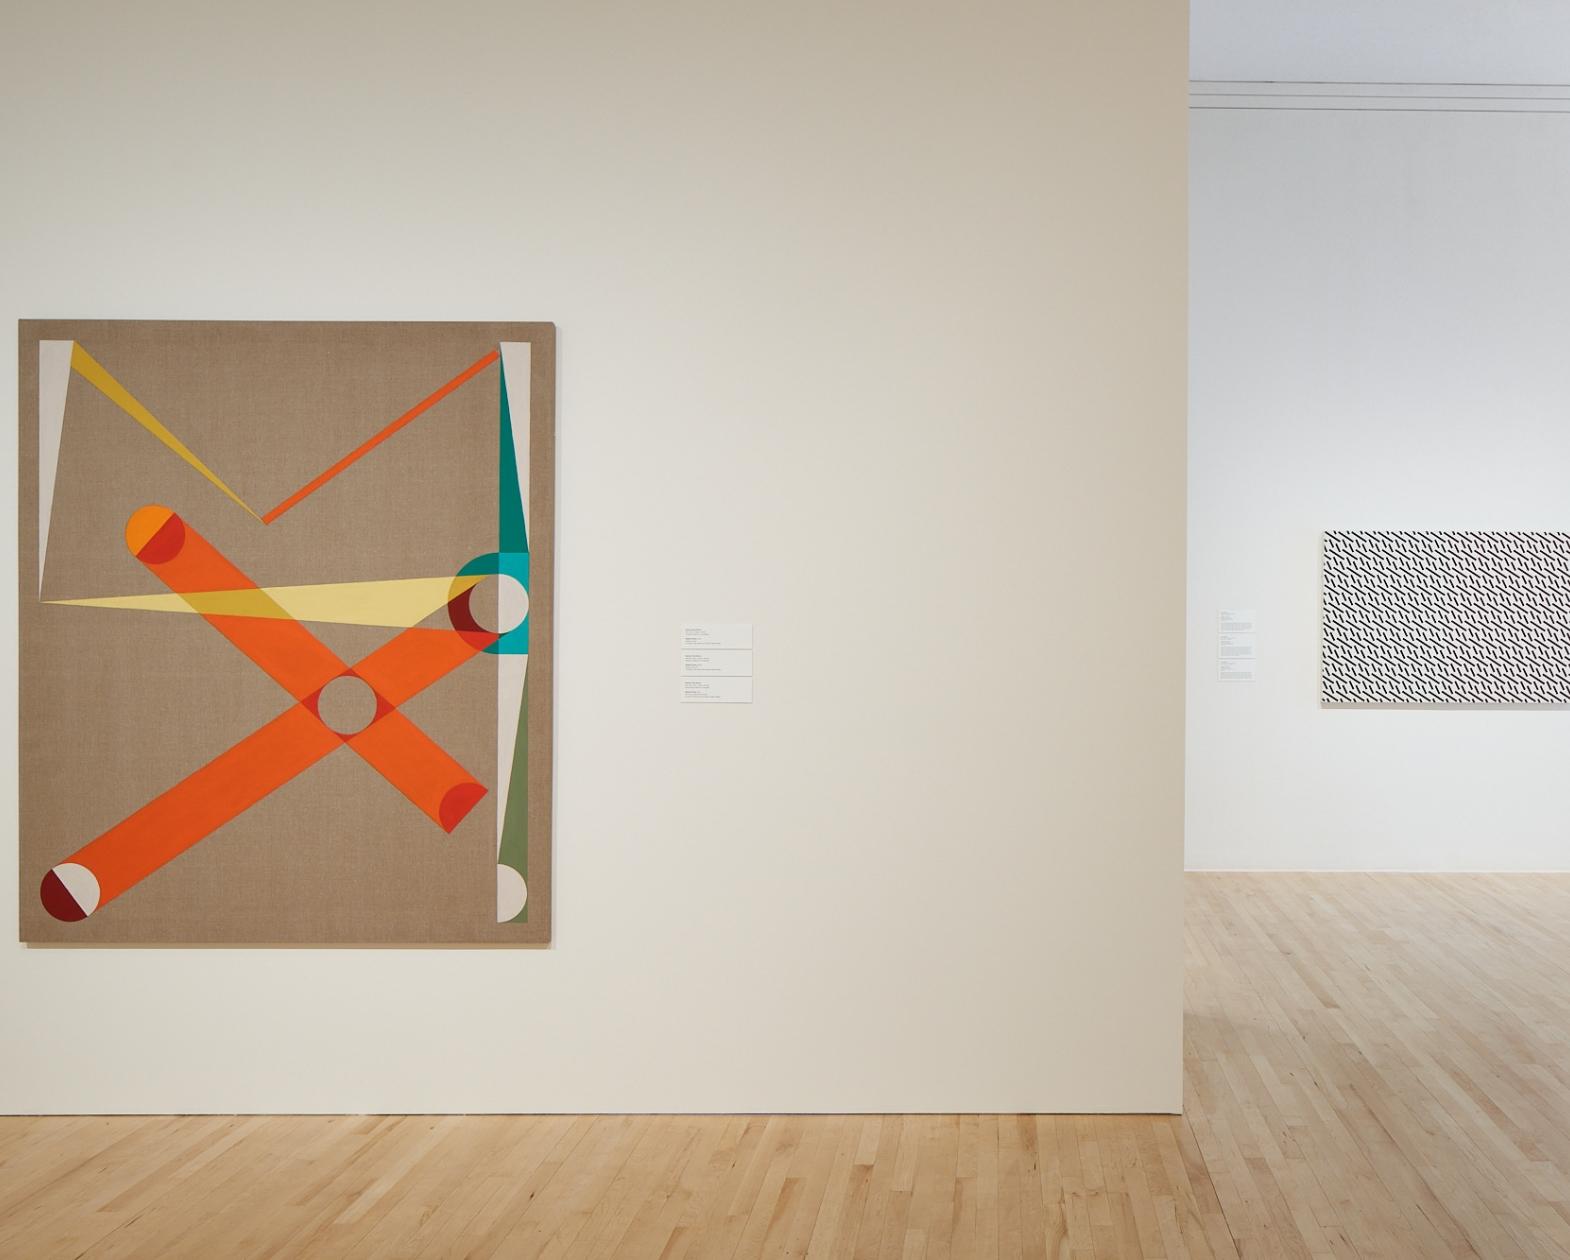 Eamon Ore-Giron at the San José Museum of Art